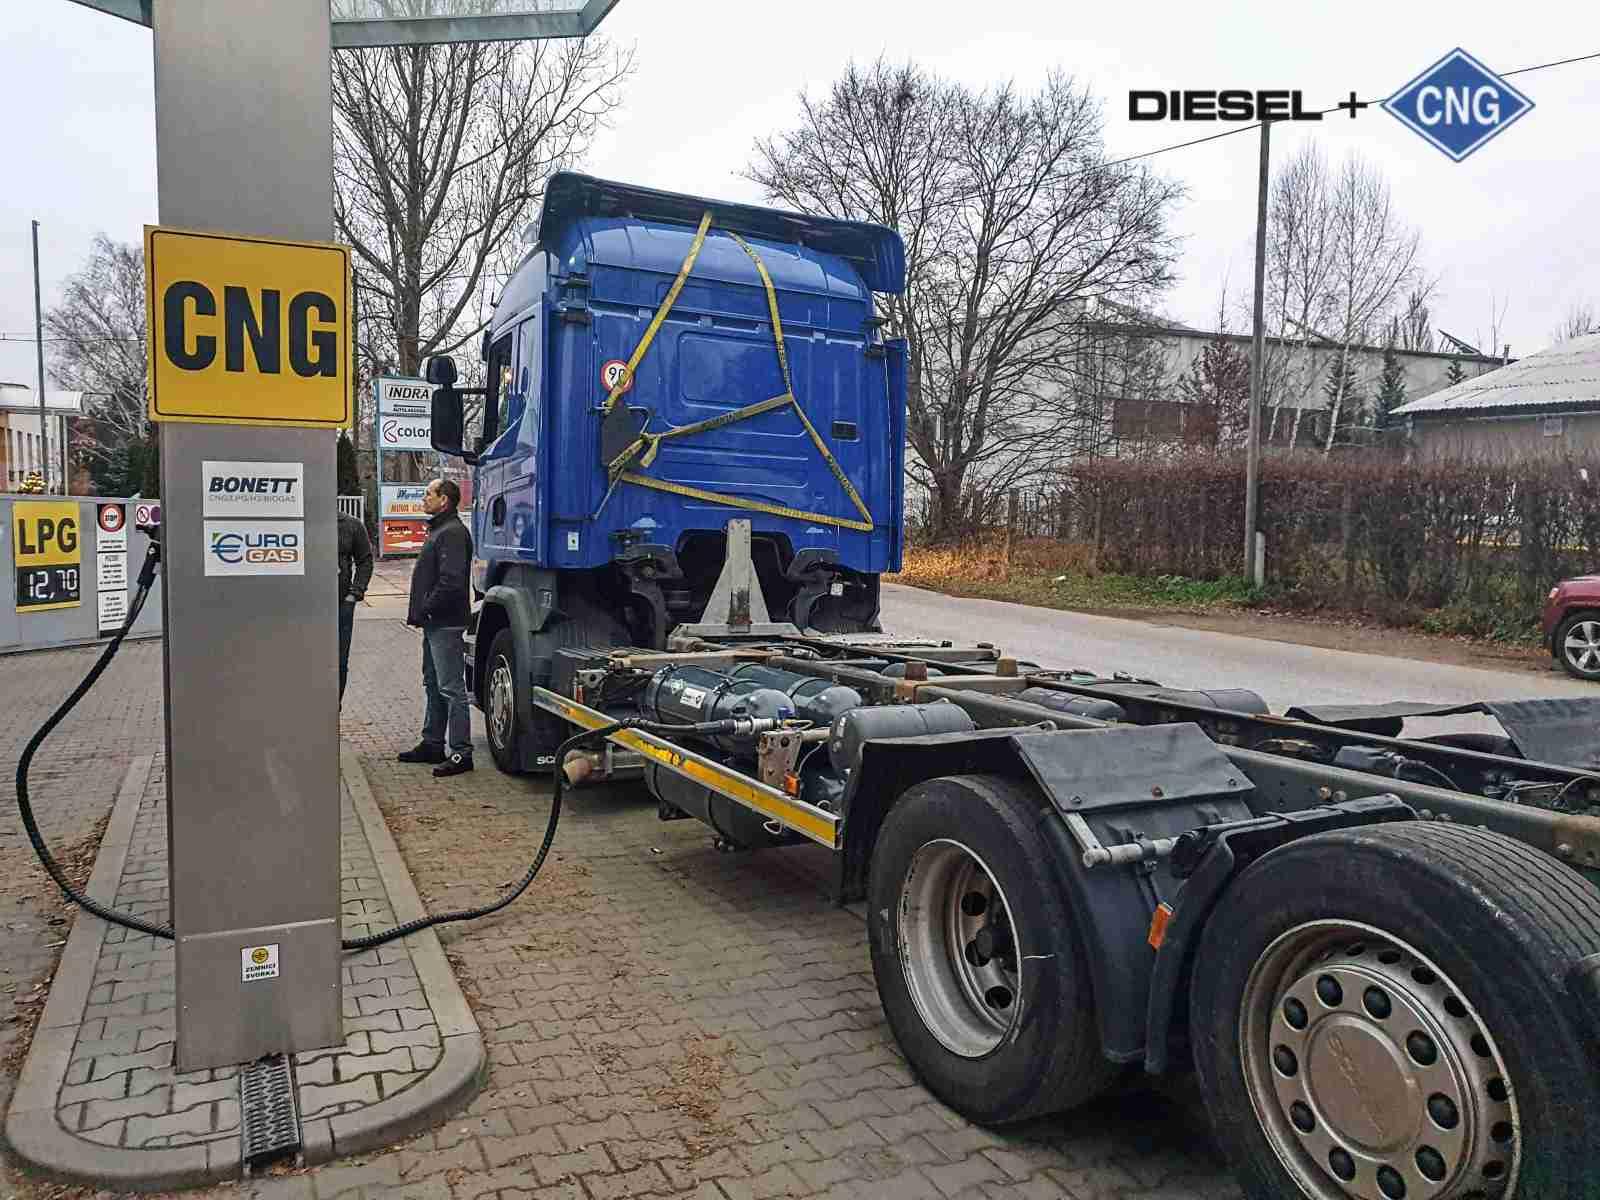 Scania R450 Diesel CNG nosič kontejnerů na duální pohon nafta a CNG